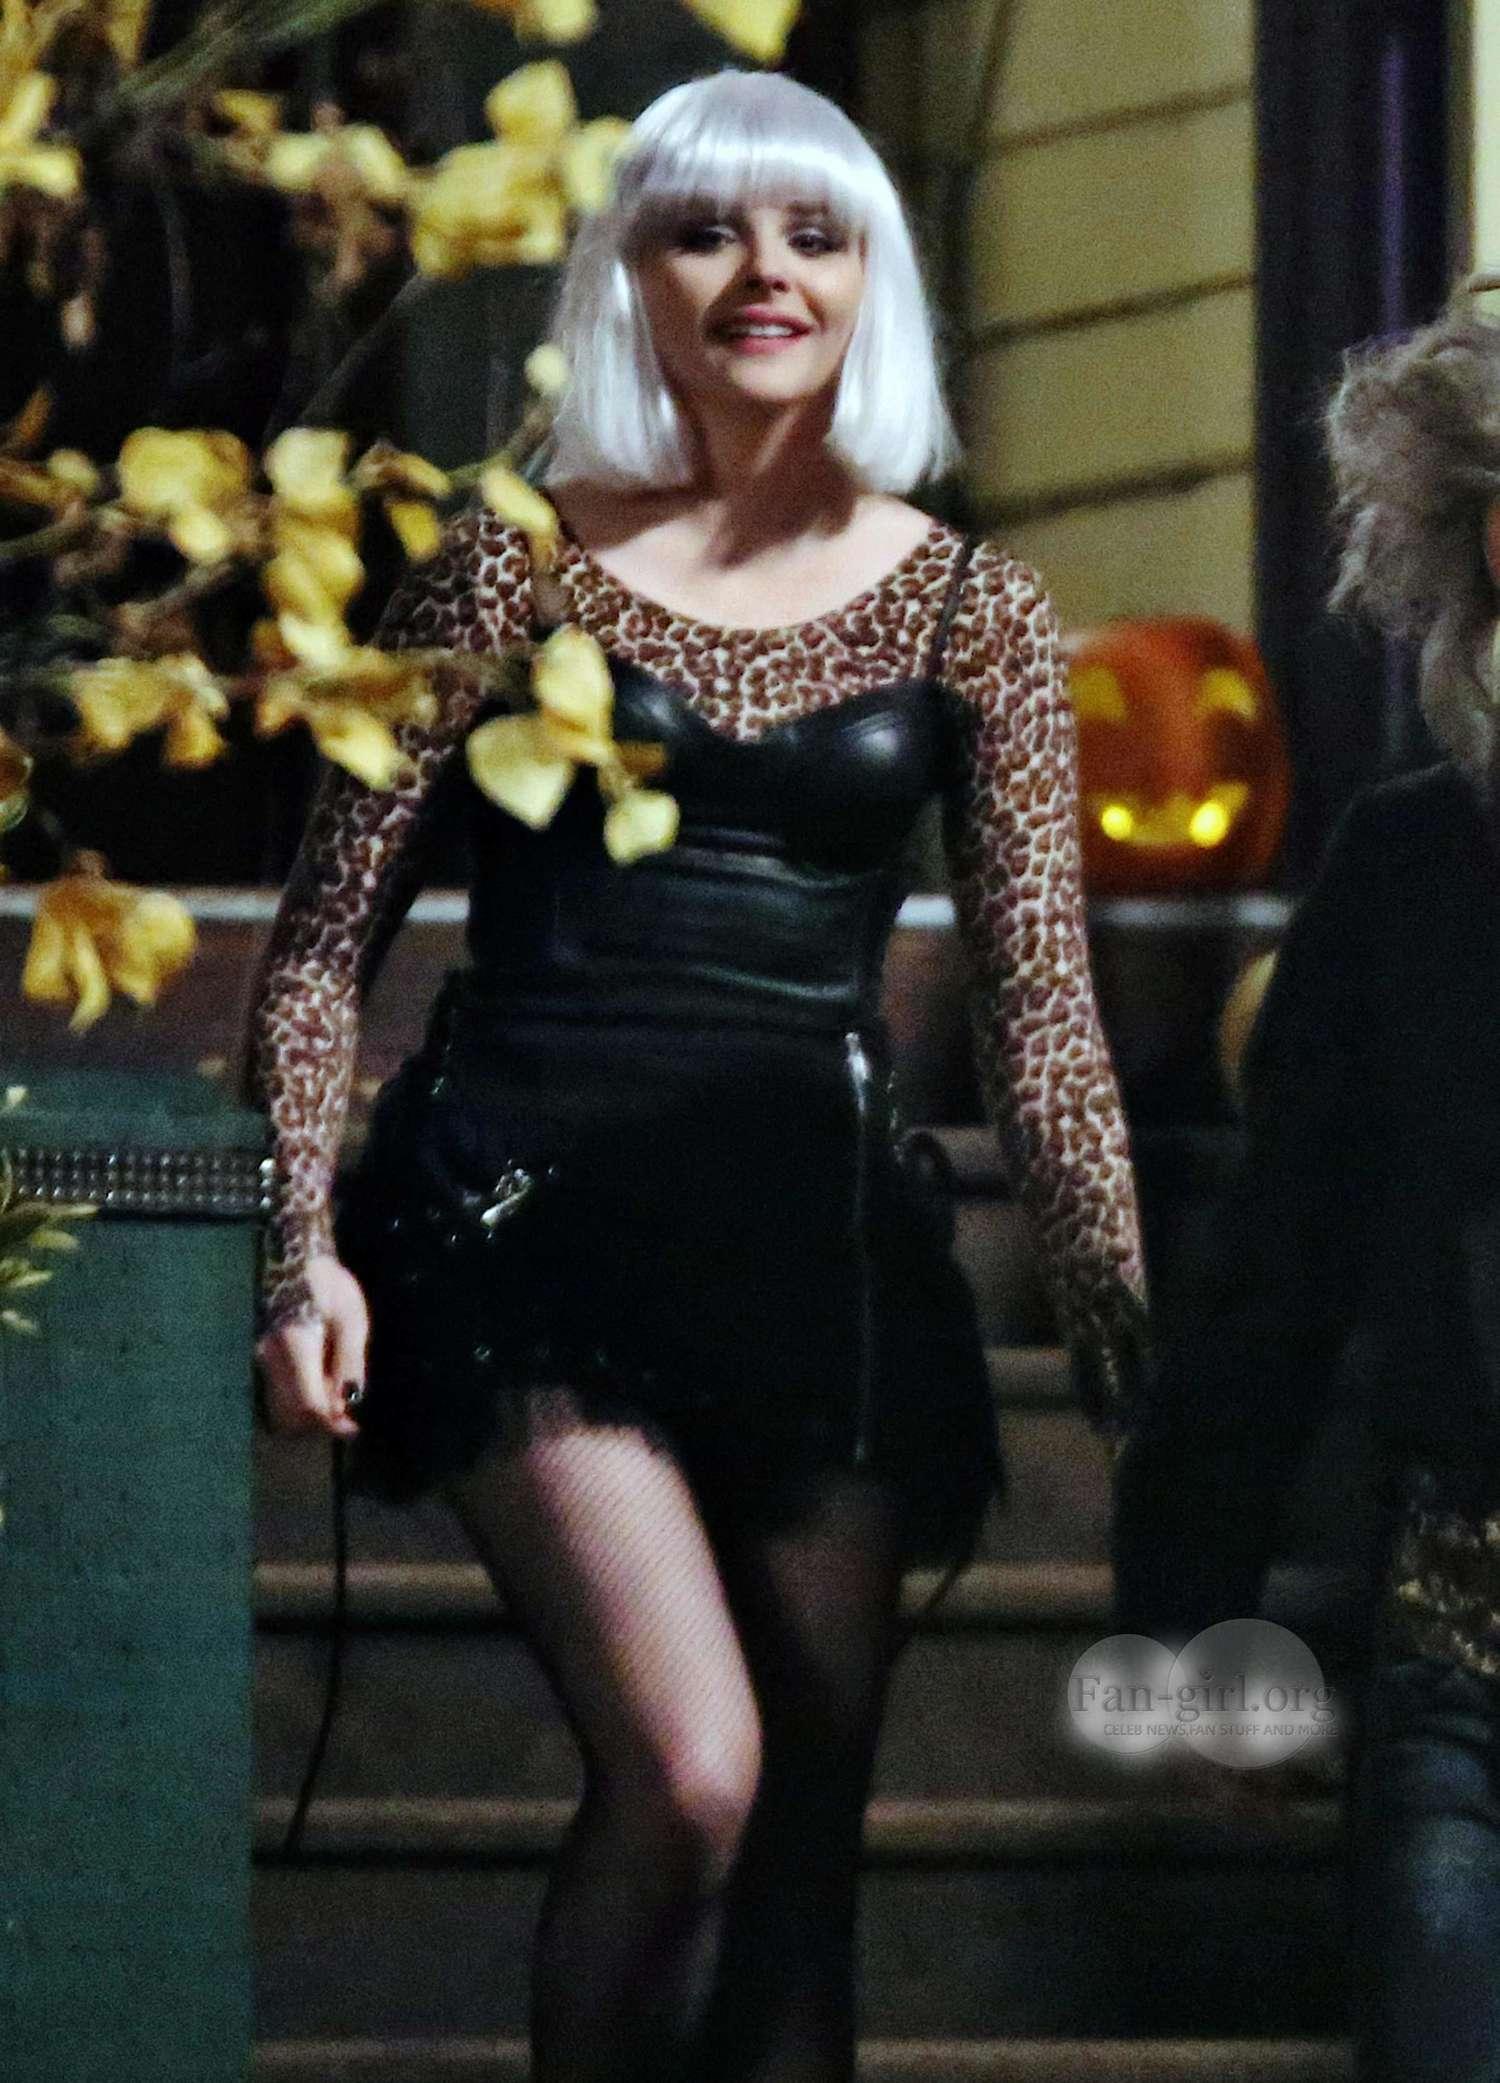 Chloe Moretz - Filming If I Stay -09 - GotCeleb